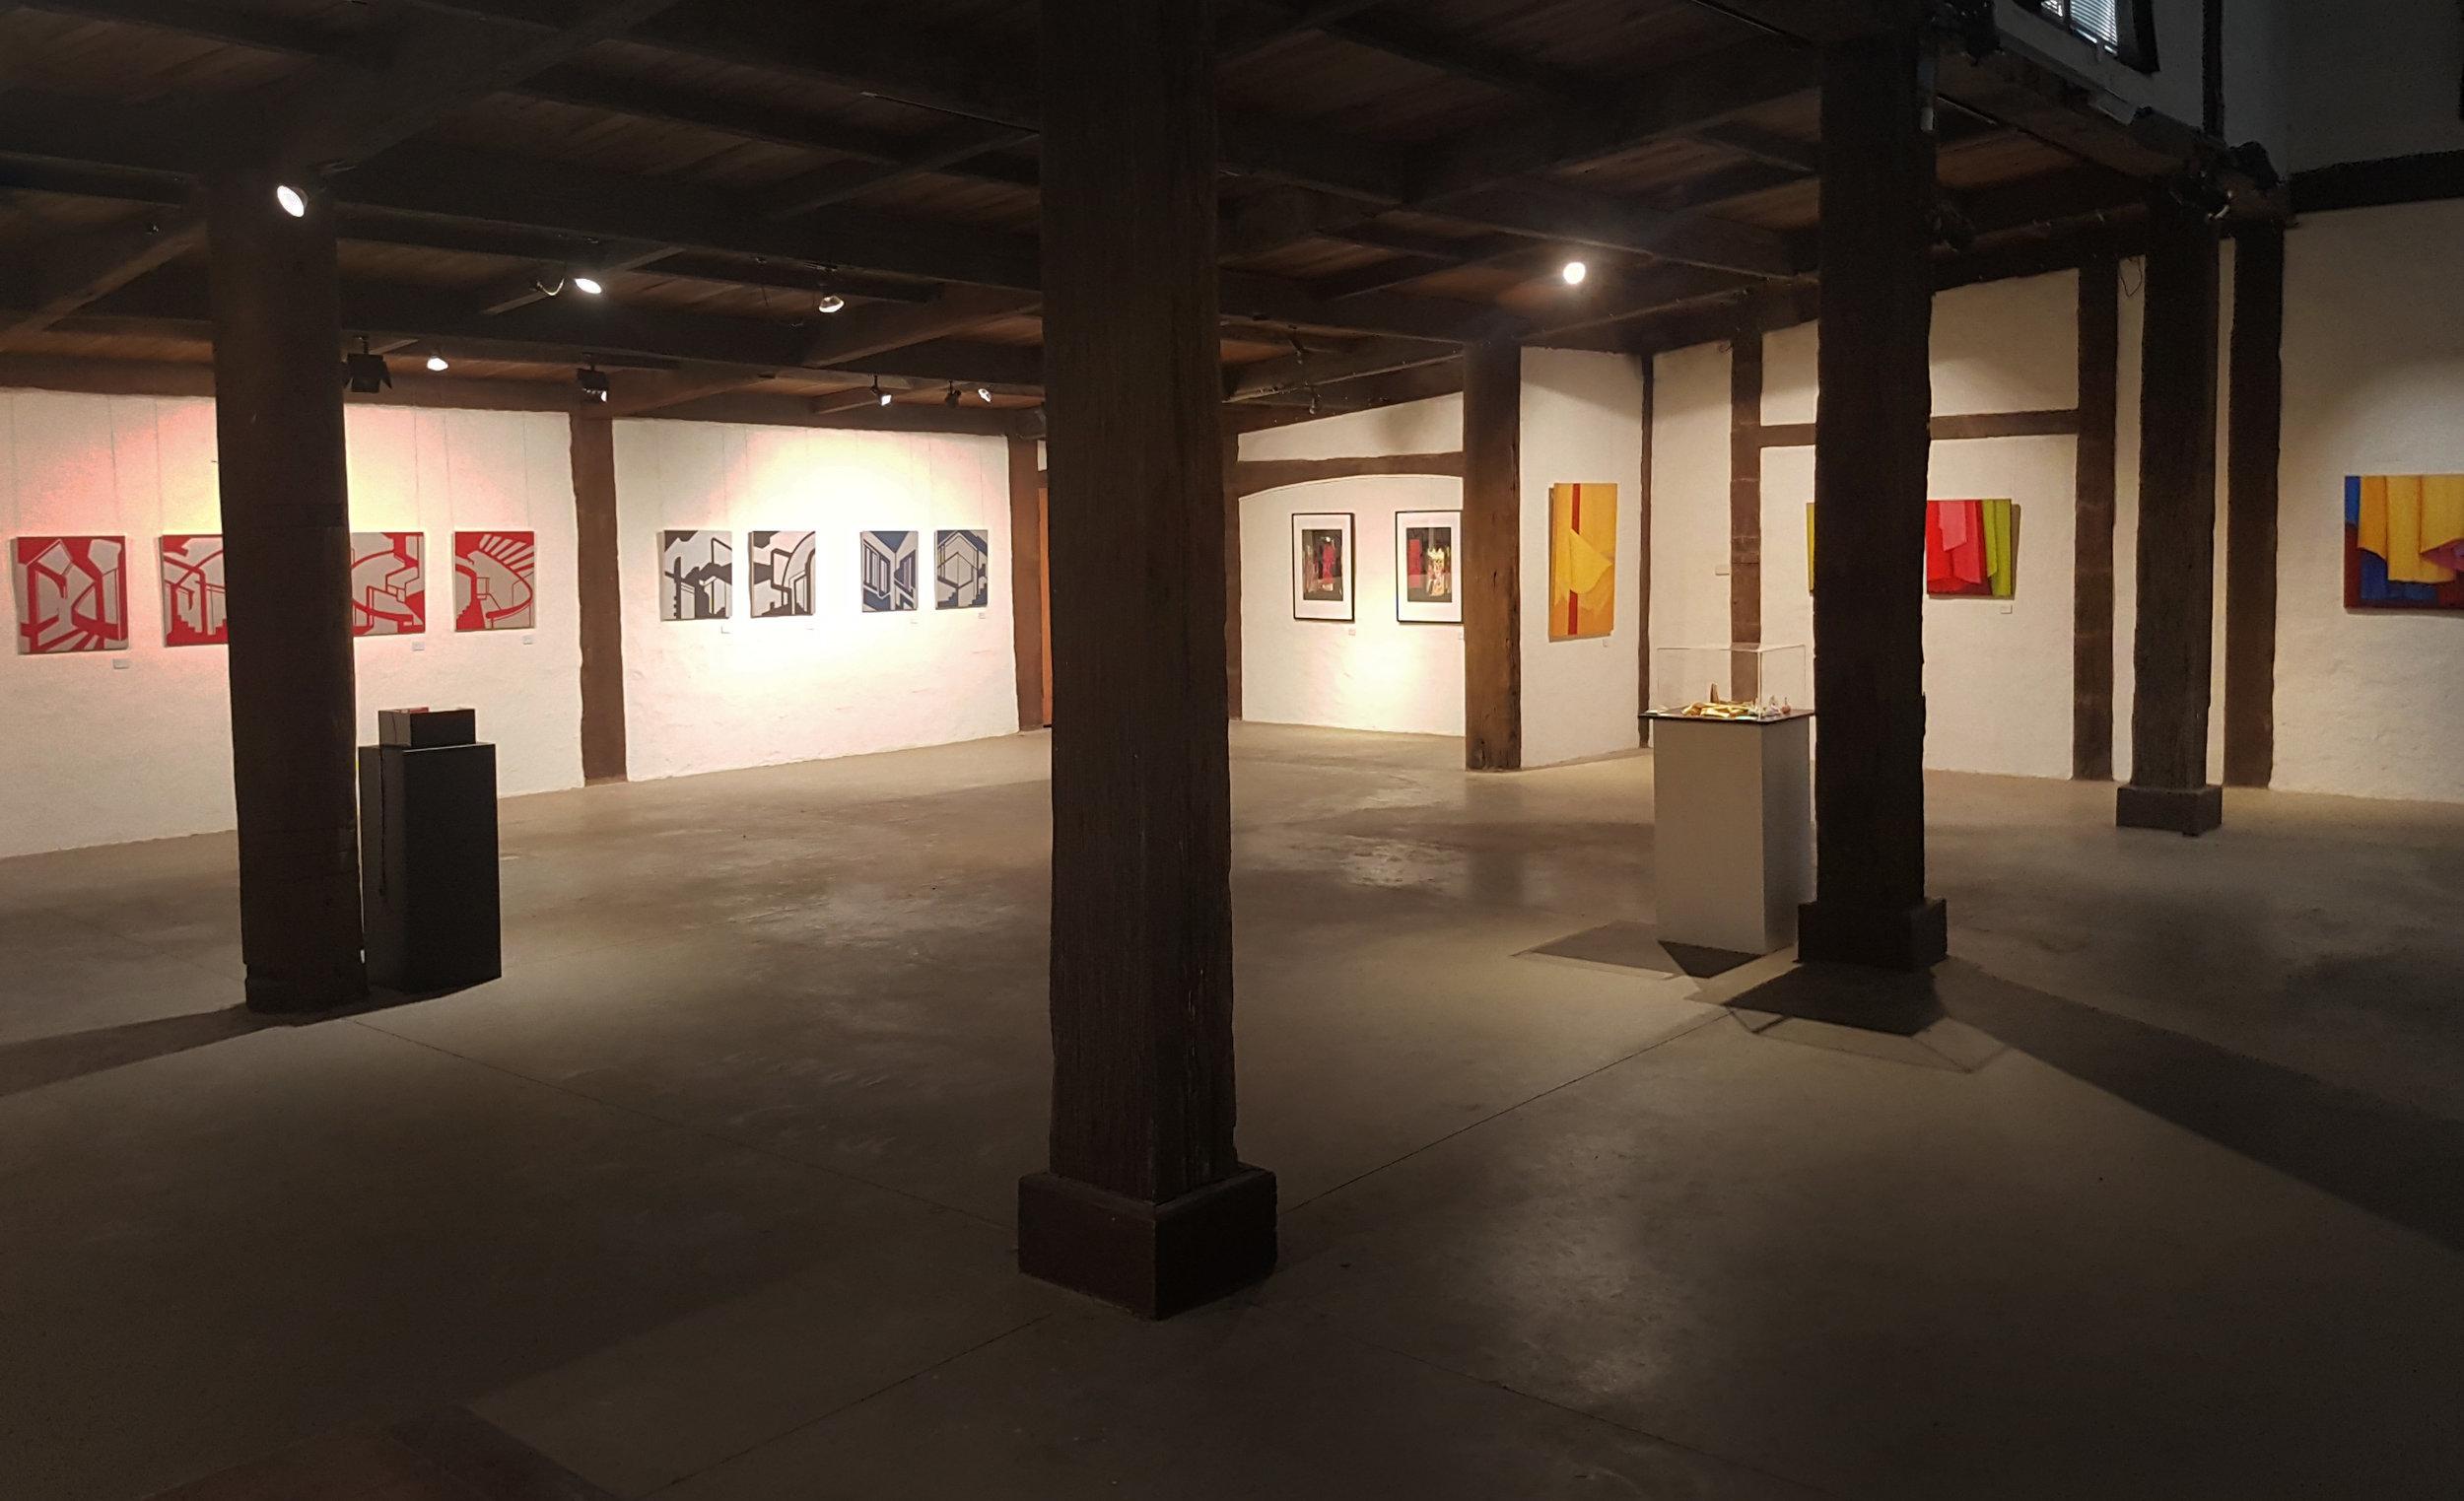 The Barn Gallery